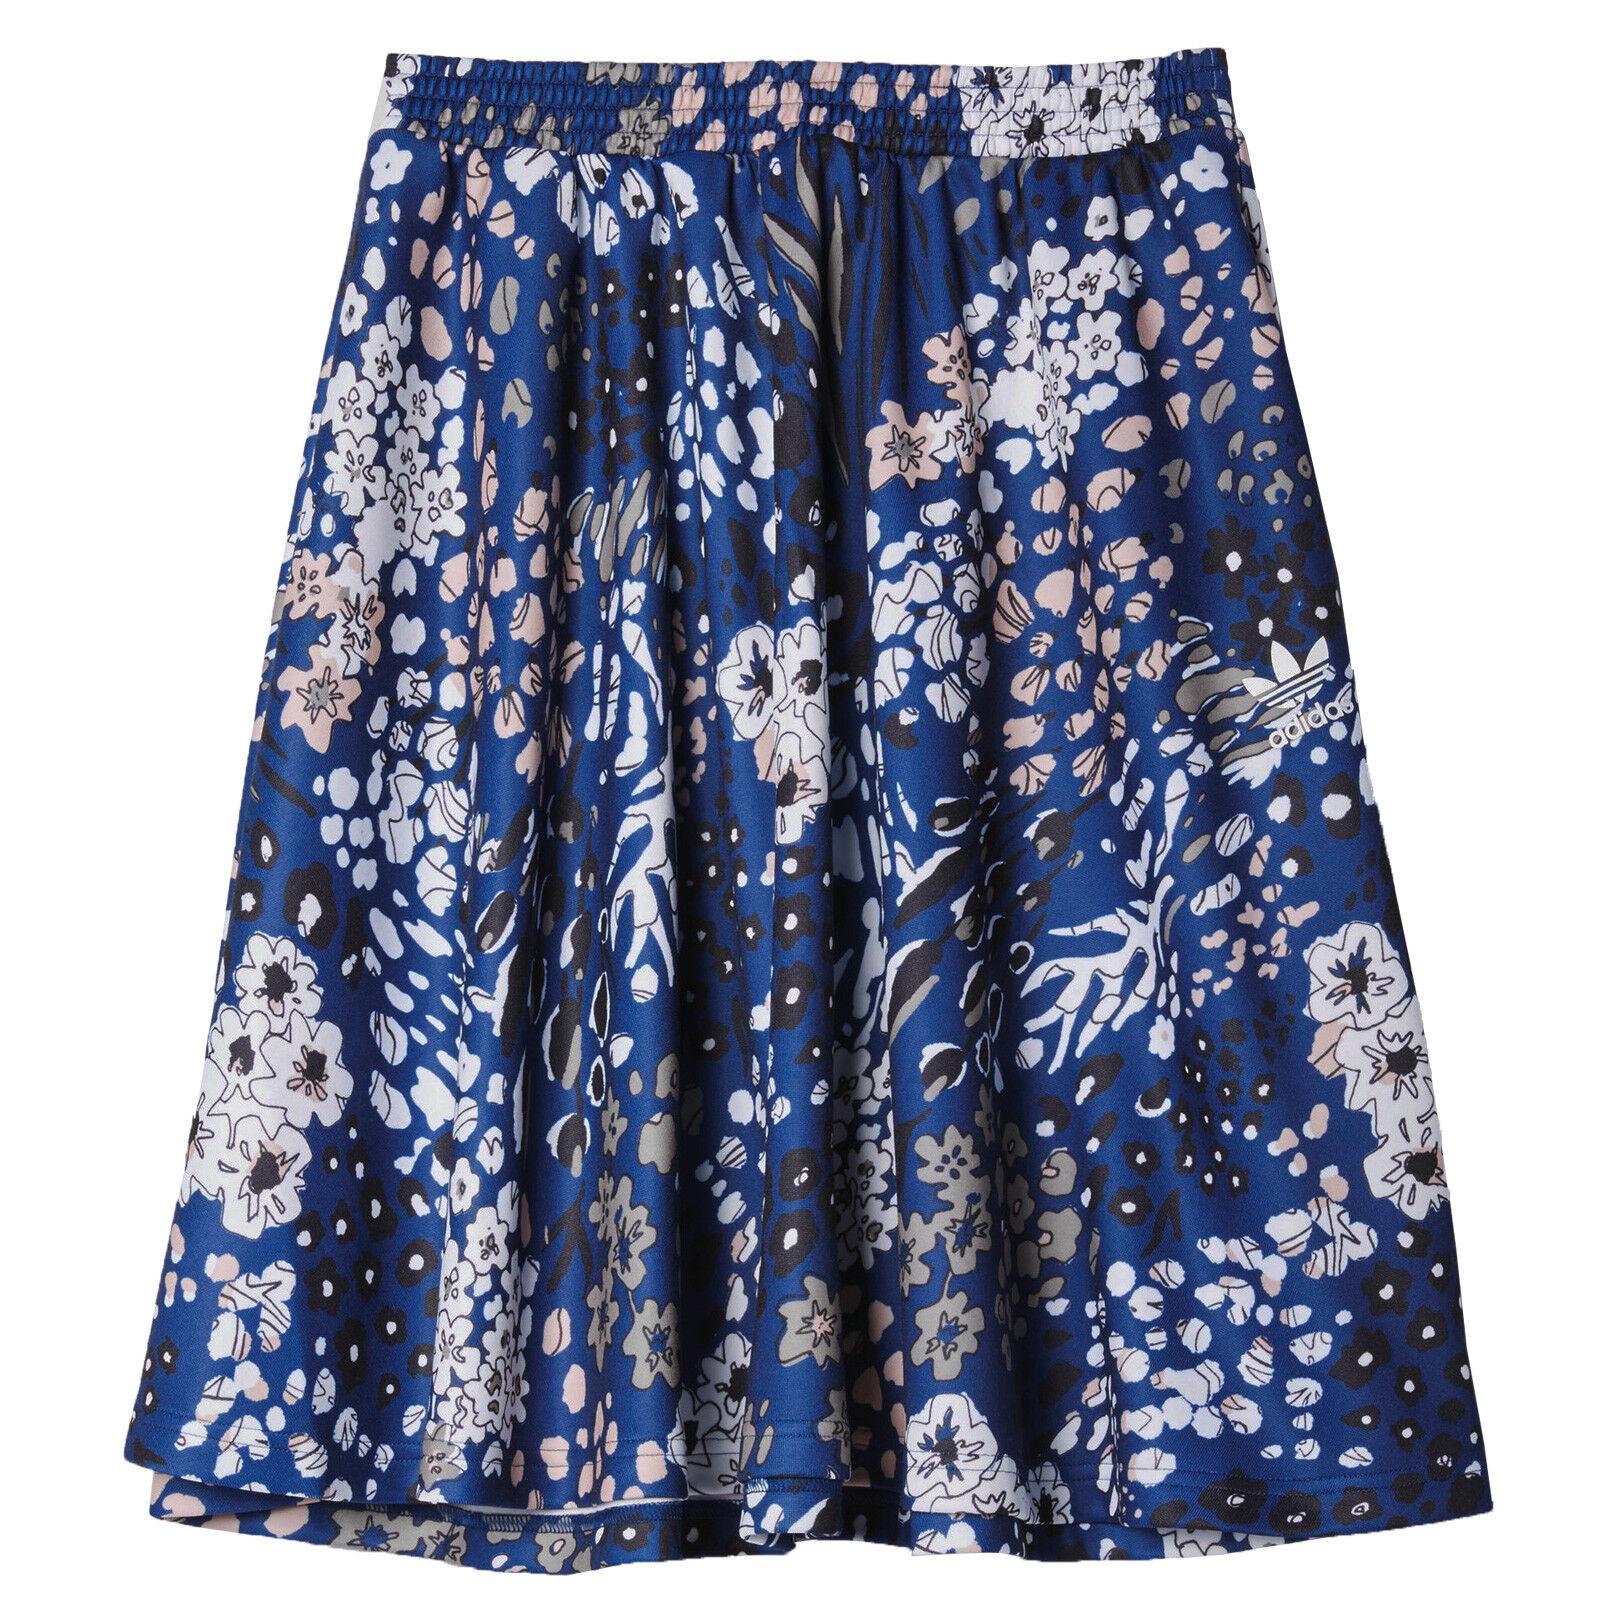 Adidas Originals Flower Skirt Beautiful Skirt with Flowers Decor bluee